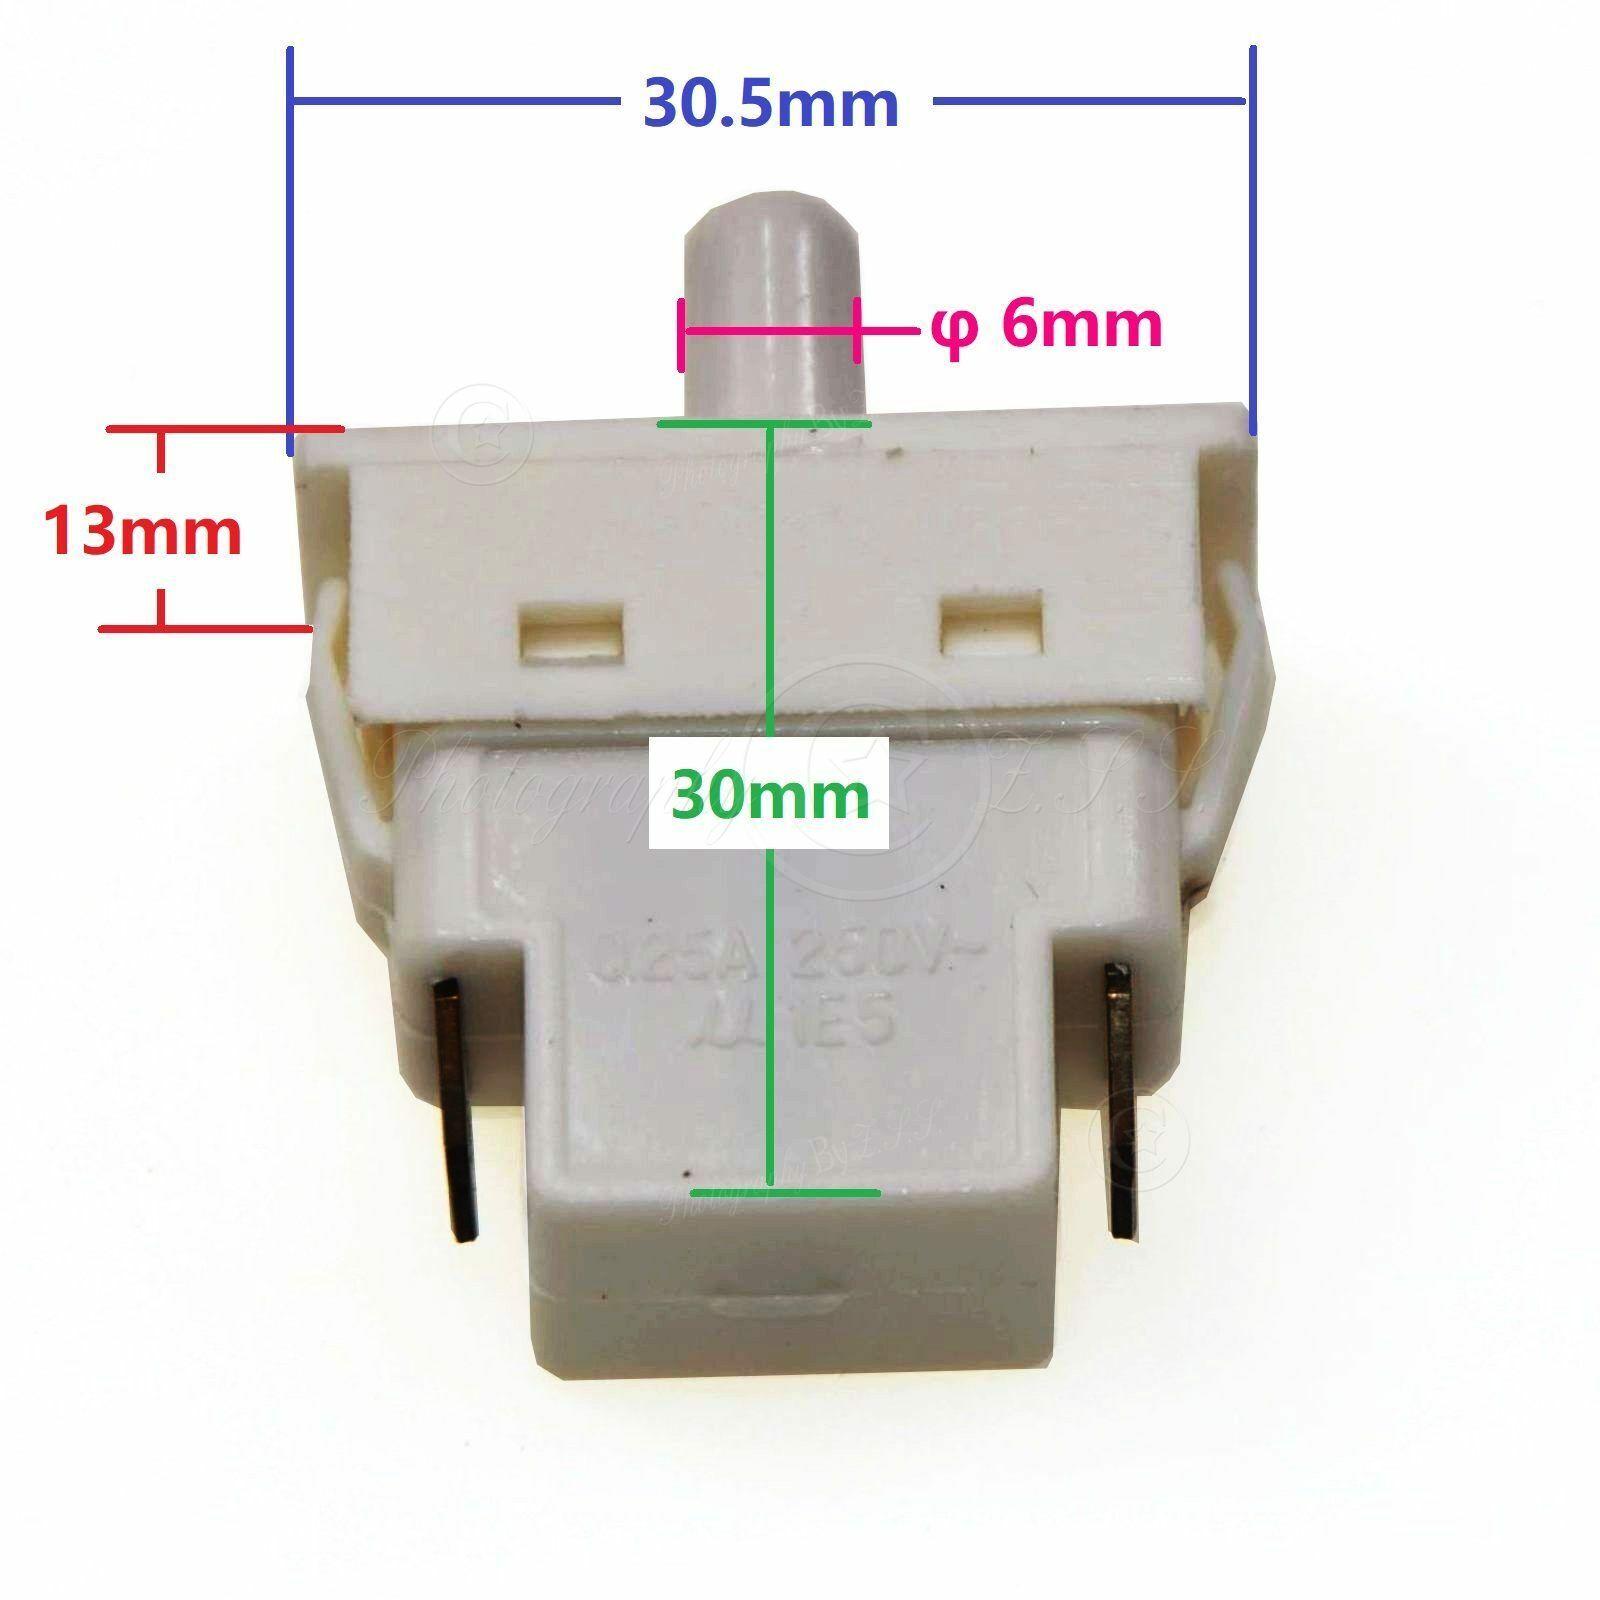 Universal 2 Pin Refrigerator DoorGated Light Switch Fridge Cooler Repair Parts